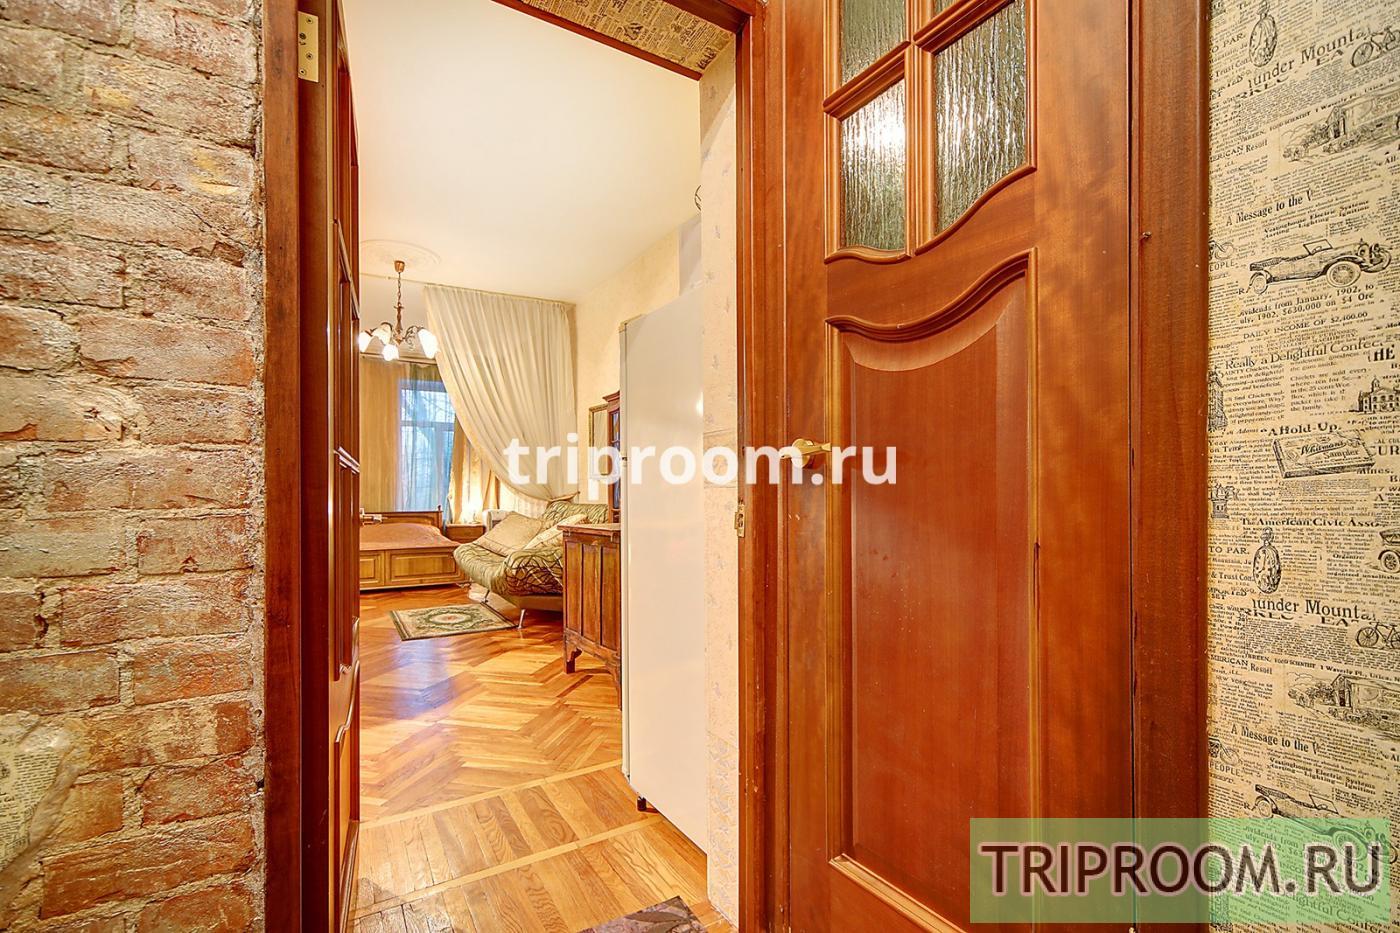 1-комнатная квартира посуточно (вариант № 15445), ул. Лиговский проспект, фото № 15